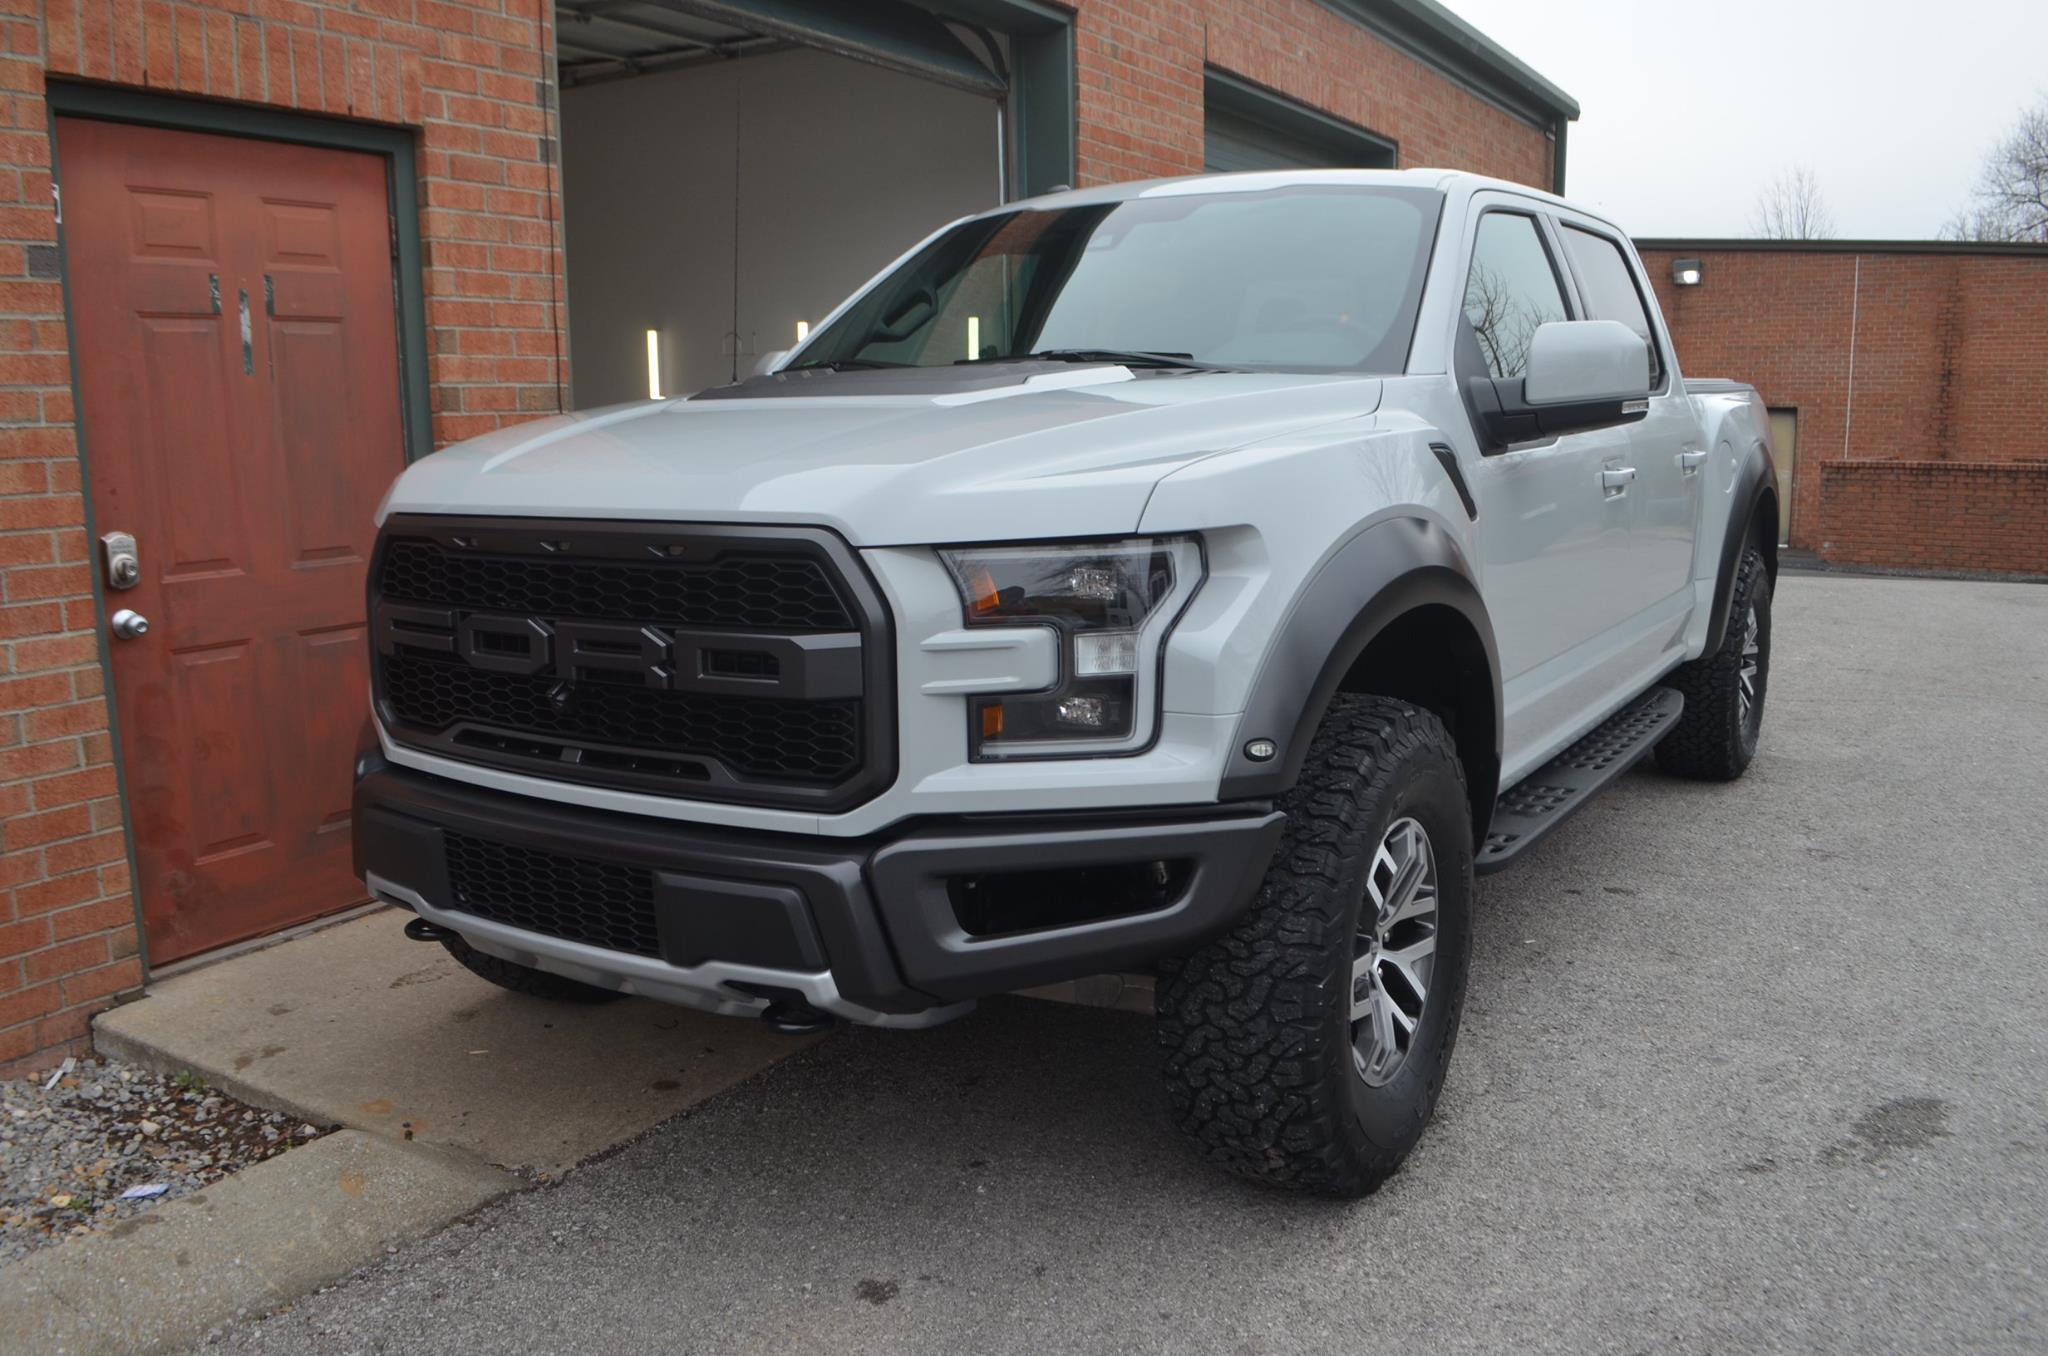 Ford Raptor: Full Body PPF